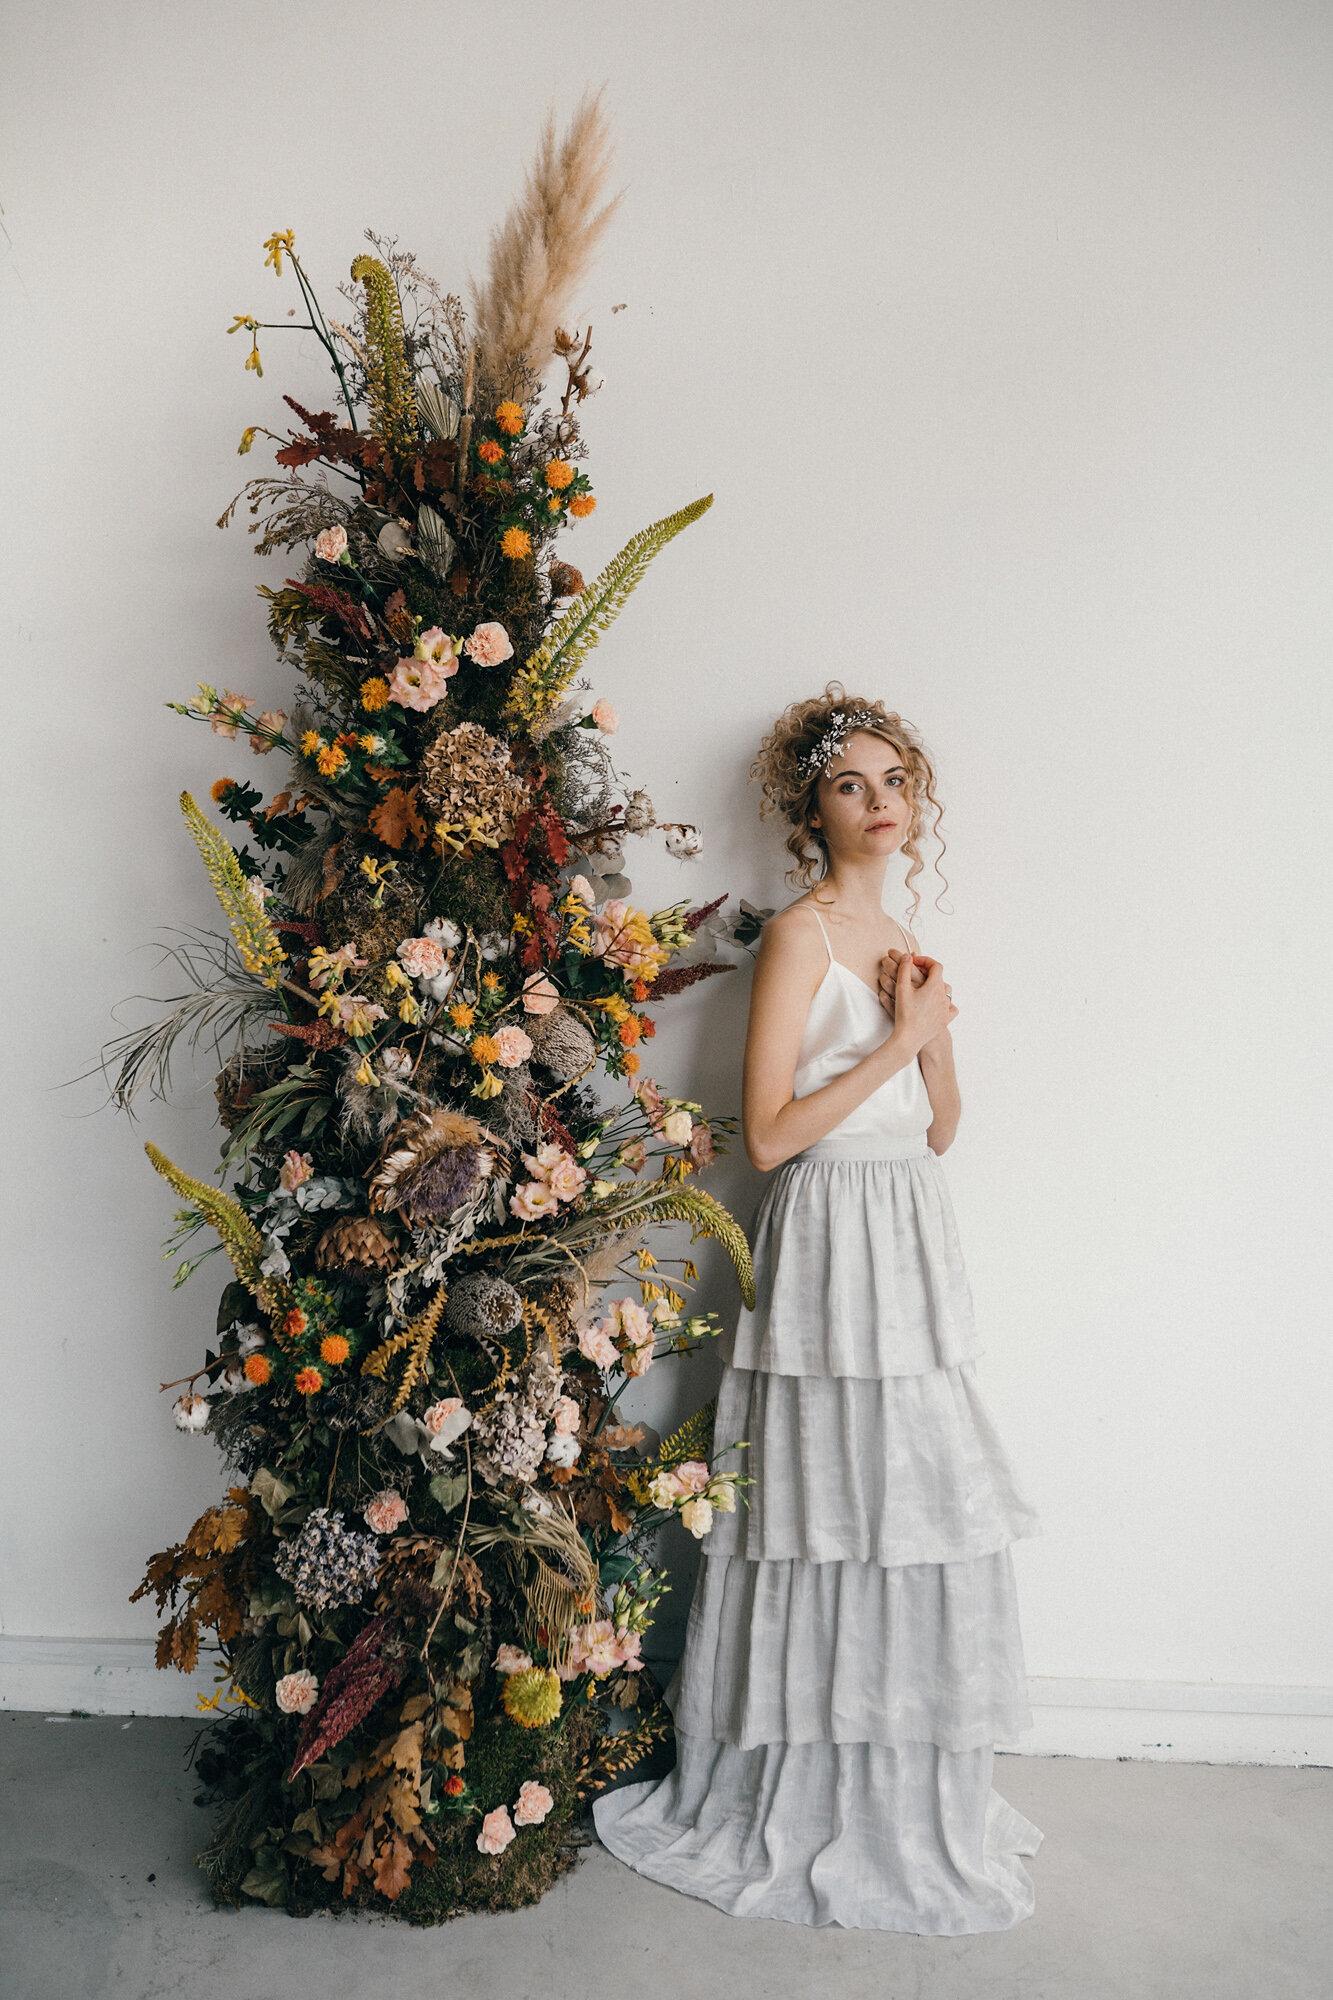 Debbie-Carlisle-Bridal-Accessories-Kate-Beaumont-Wedding-Gowns-Sheffield-Yorkshire-UK-23.jpg